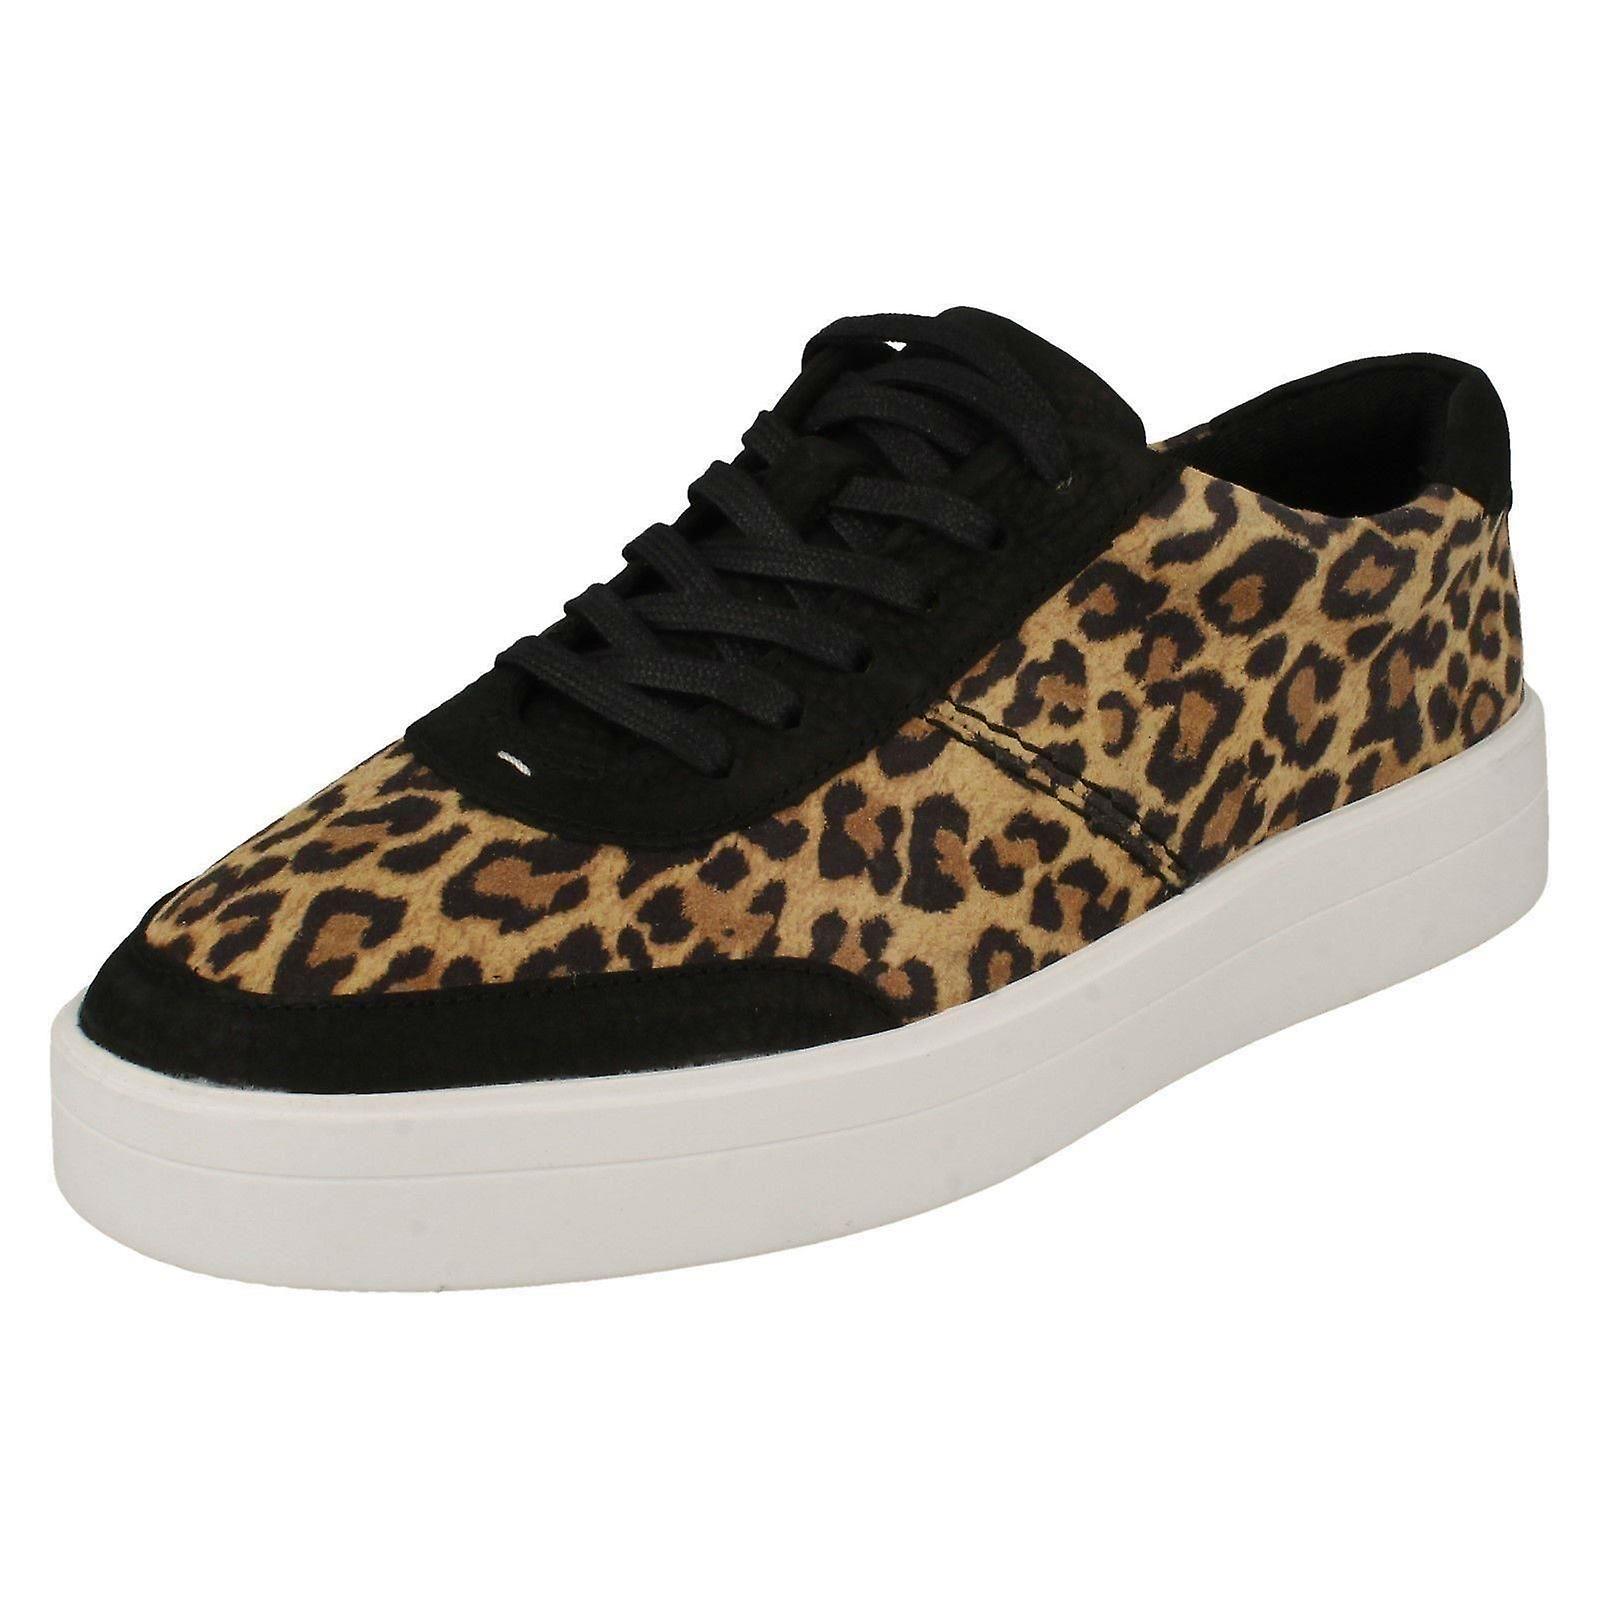 Ladies Clarks Animal Detailed Lace Up Shoes Hero Walk o2rPH